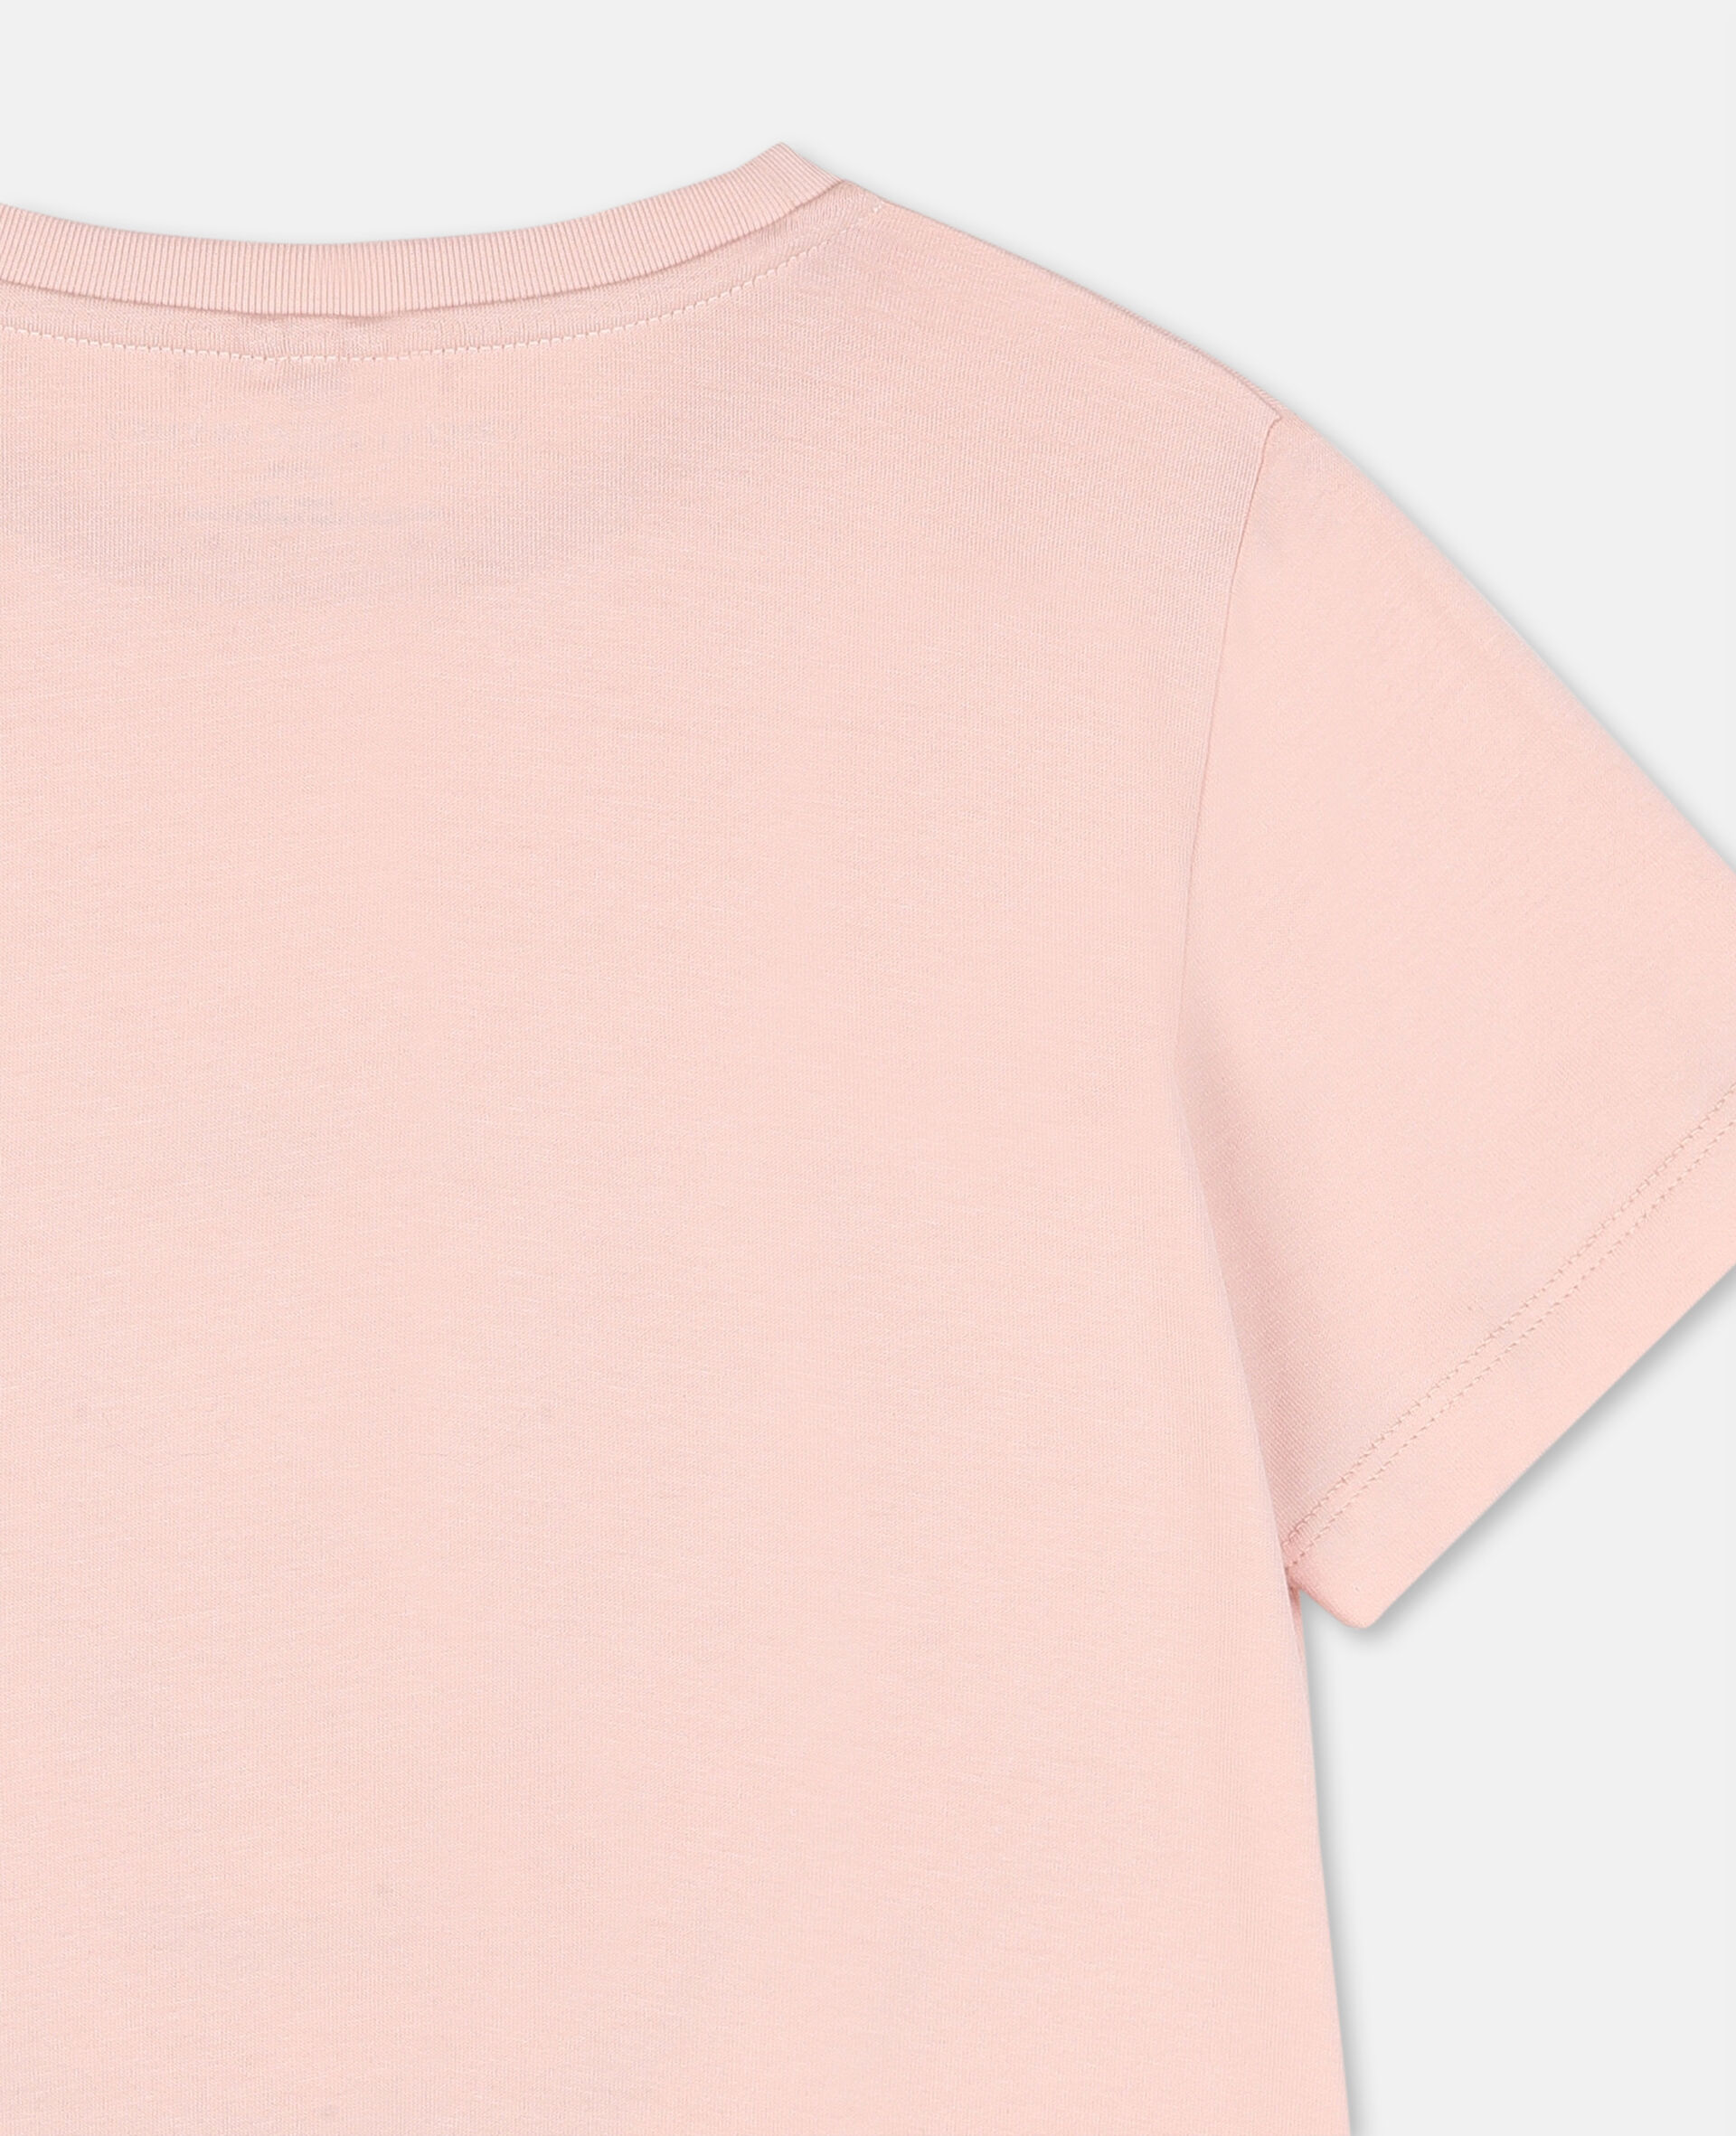 Dancing Flamingo Cotton T-shirt-Pink-large image number 2